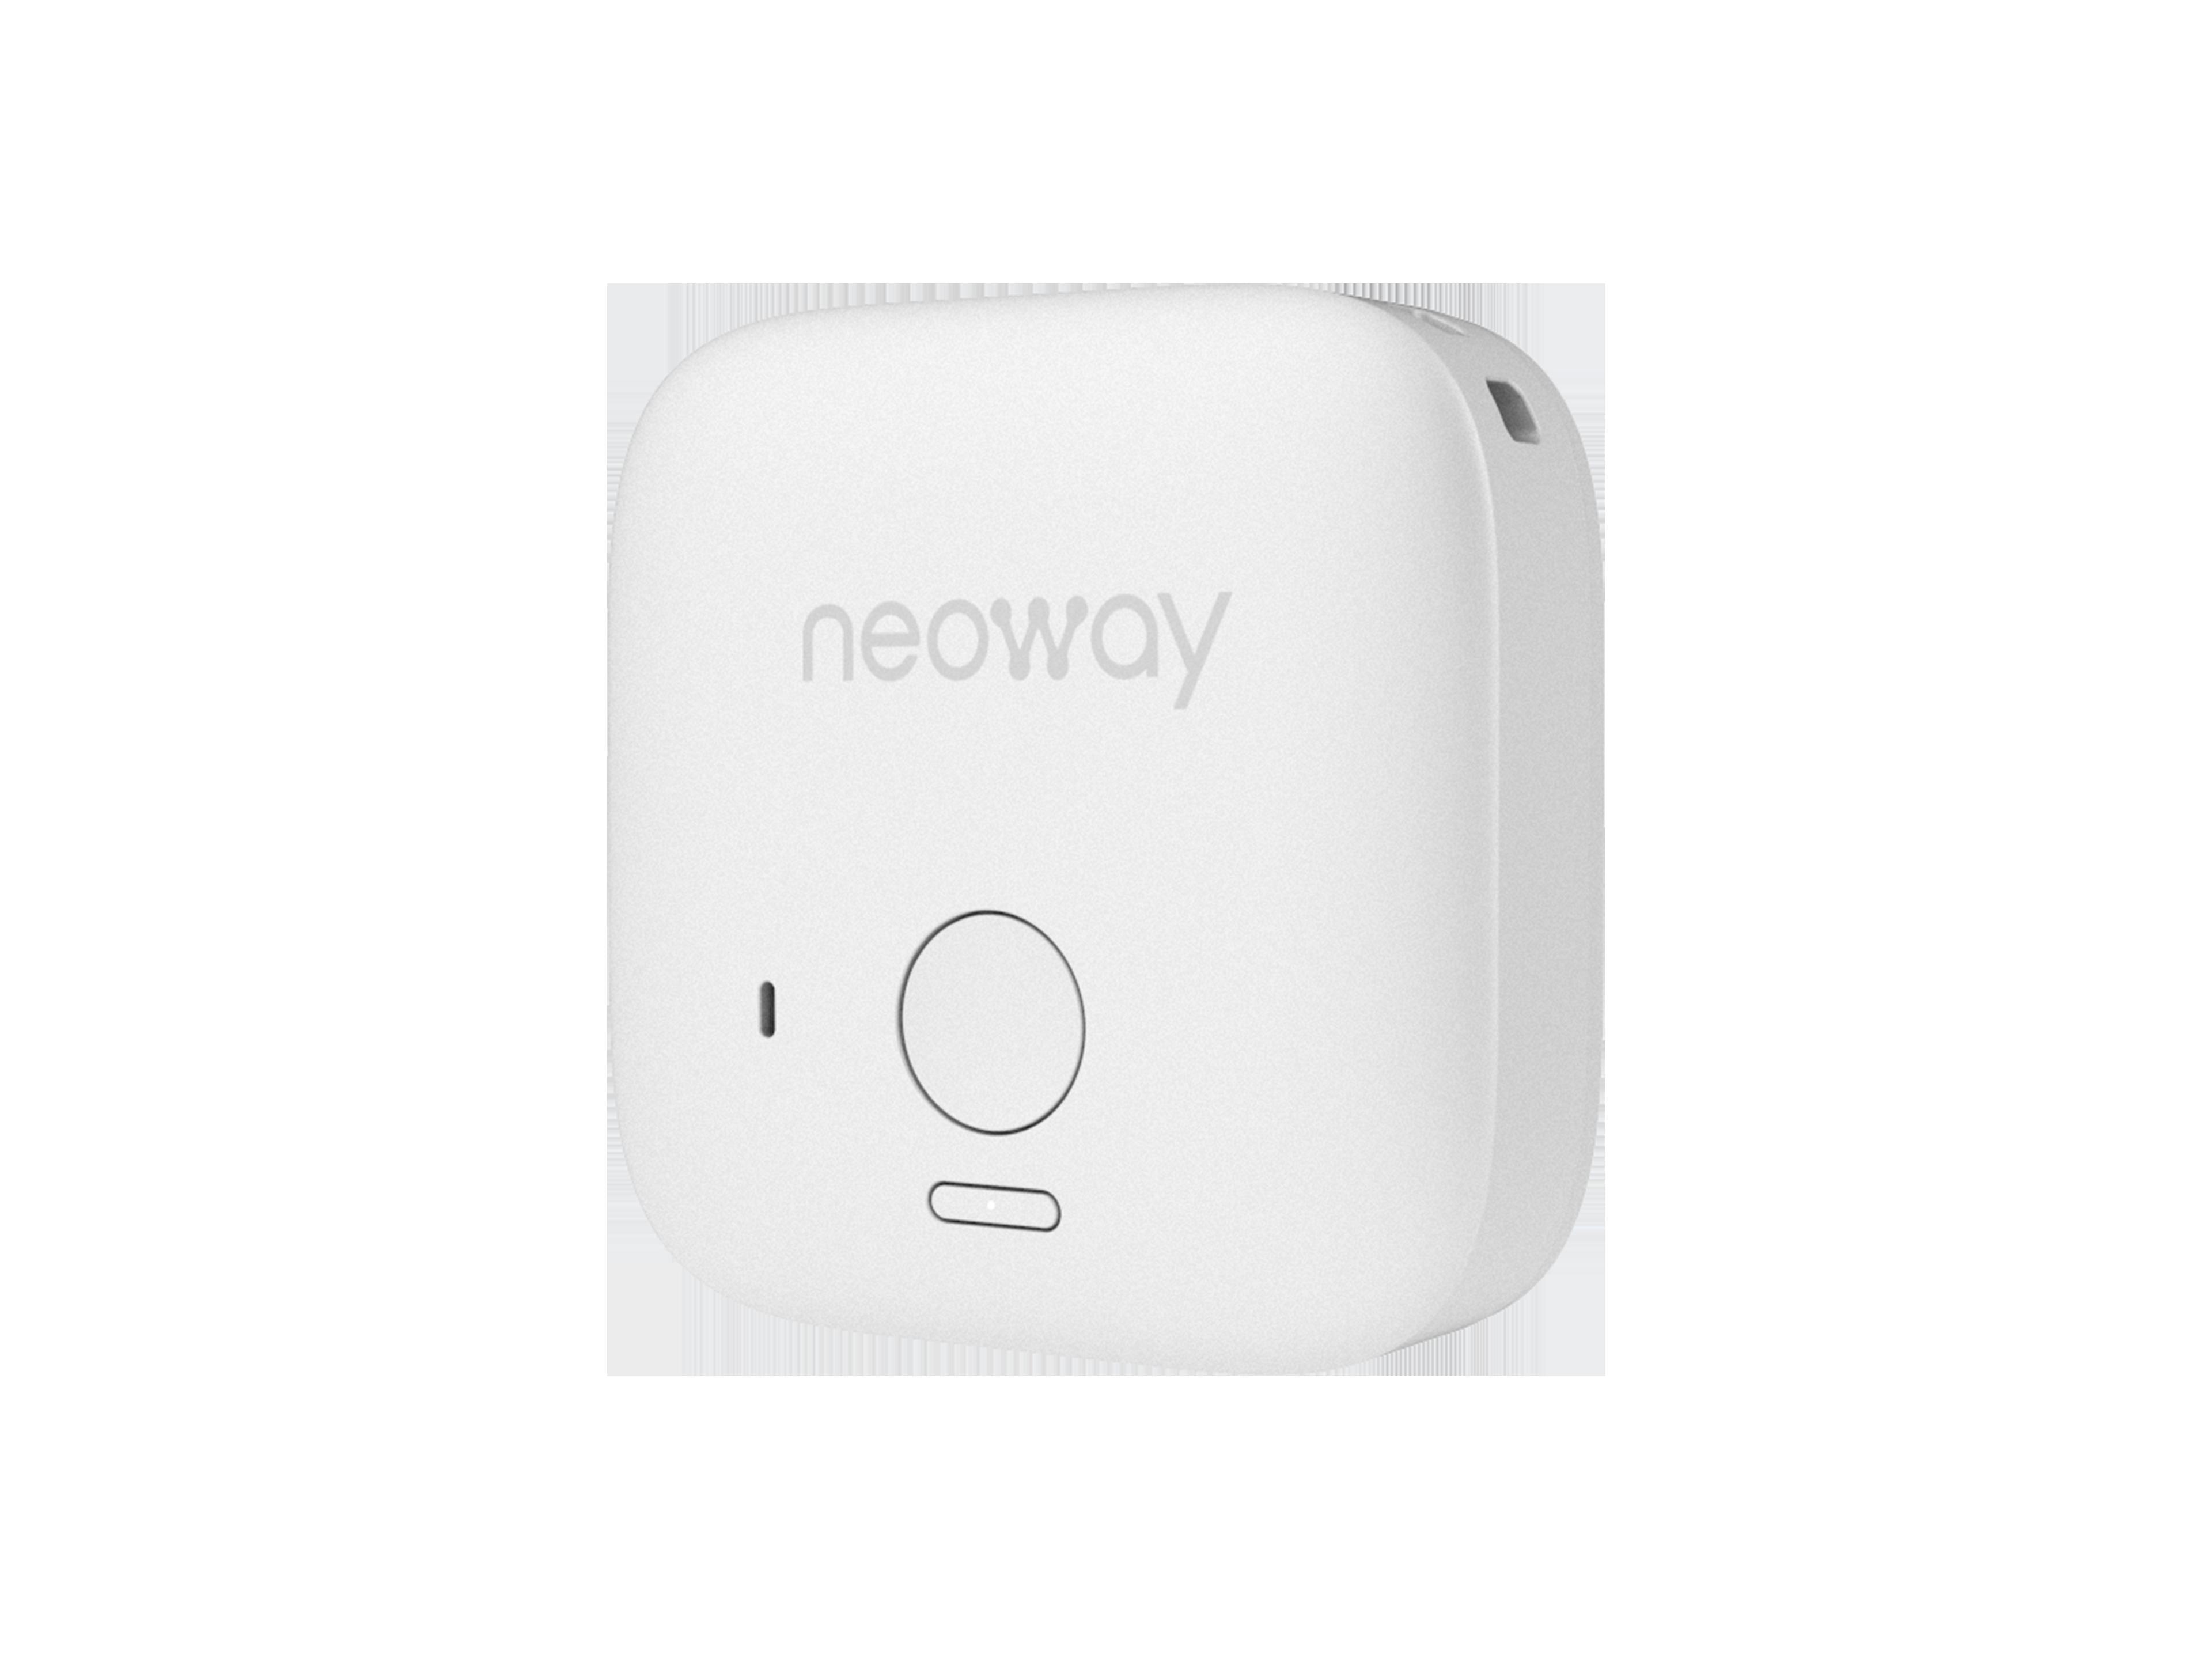 Neoway T501